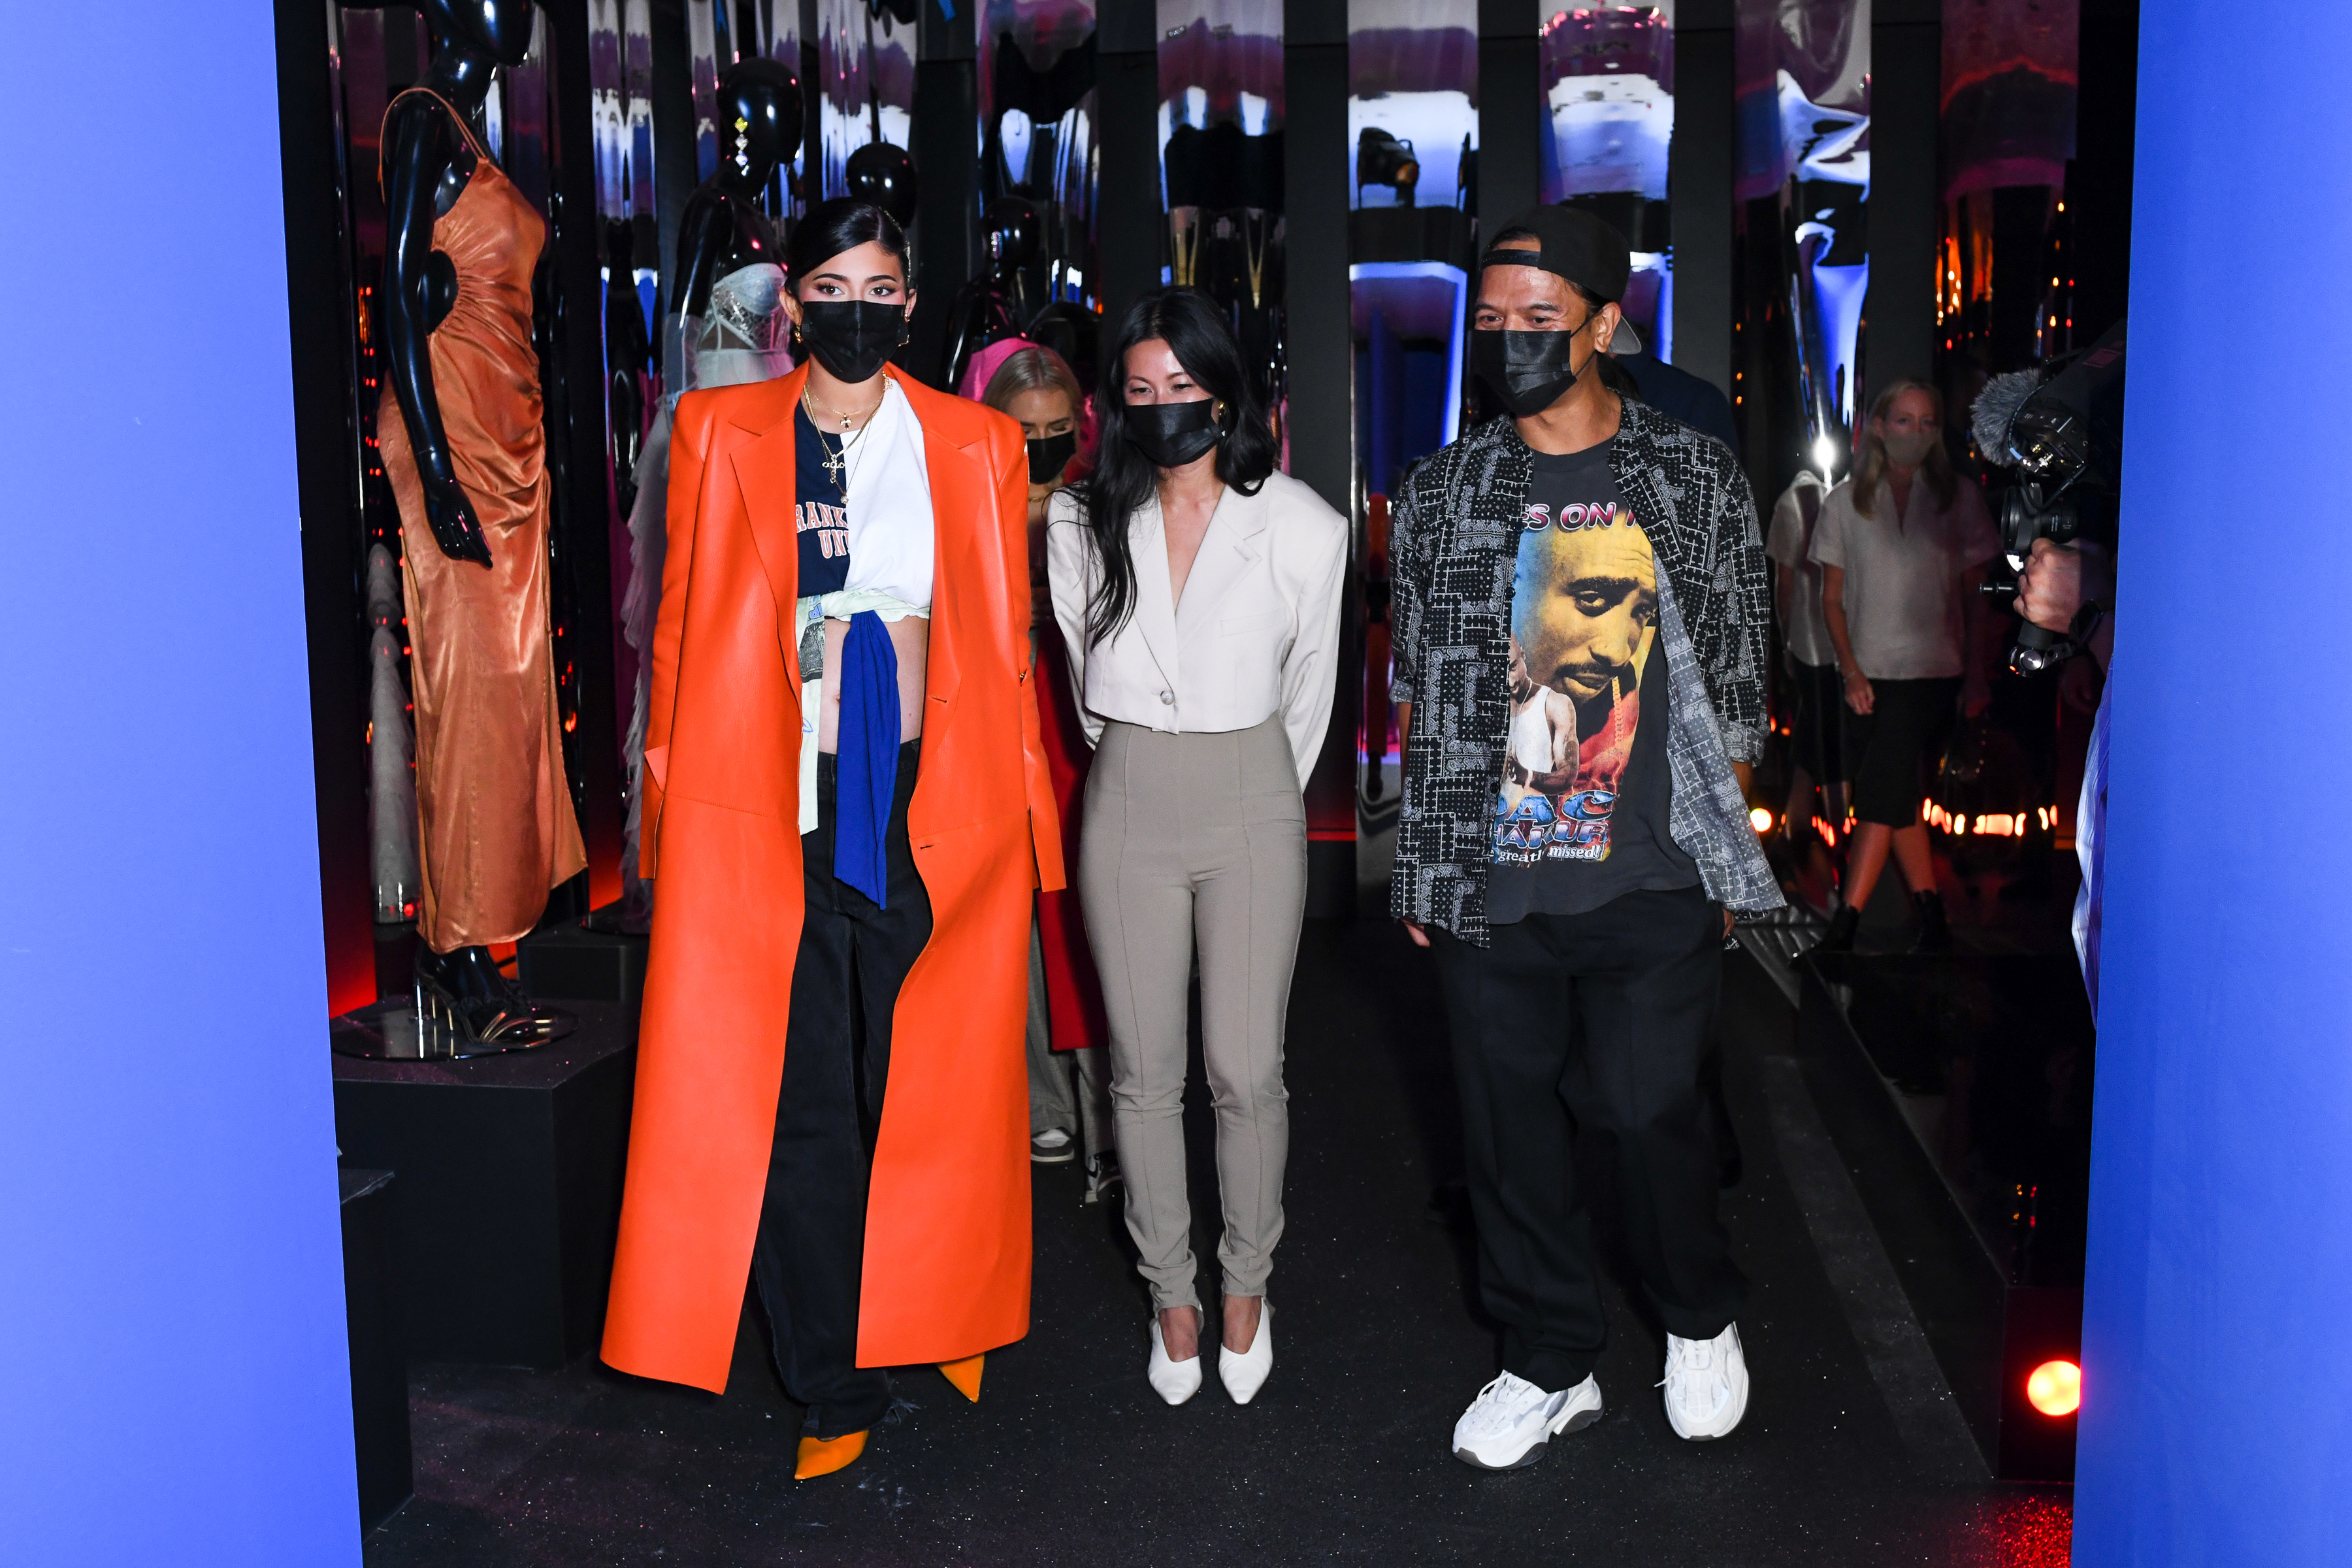 Kylie Jenner, Revolve, Revolve Gallery, New York Fashion Week, Hudson Yards